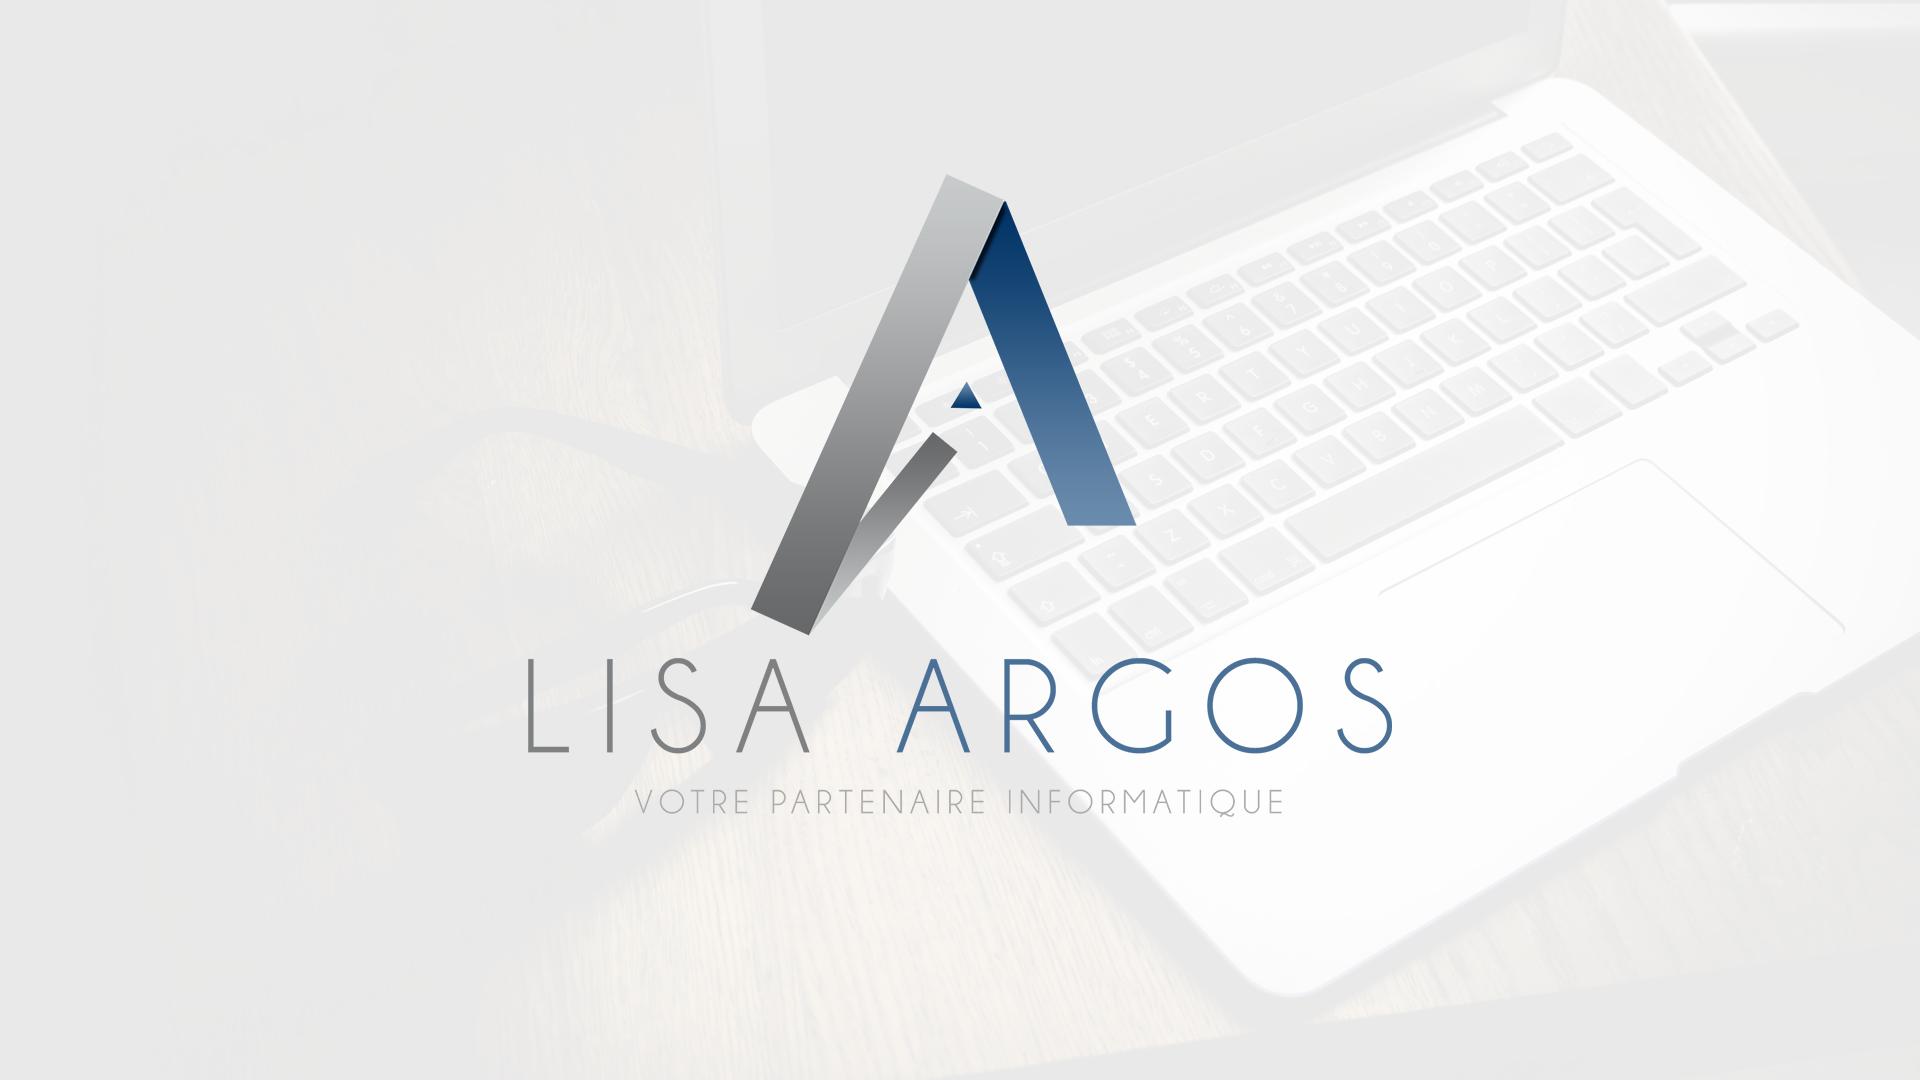 LISA ARGOS - Votre partenaire informatique